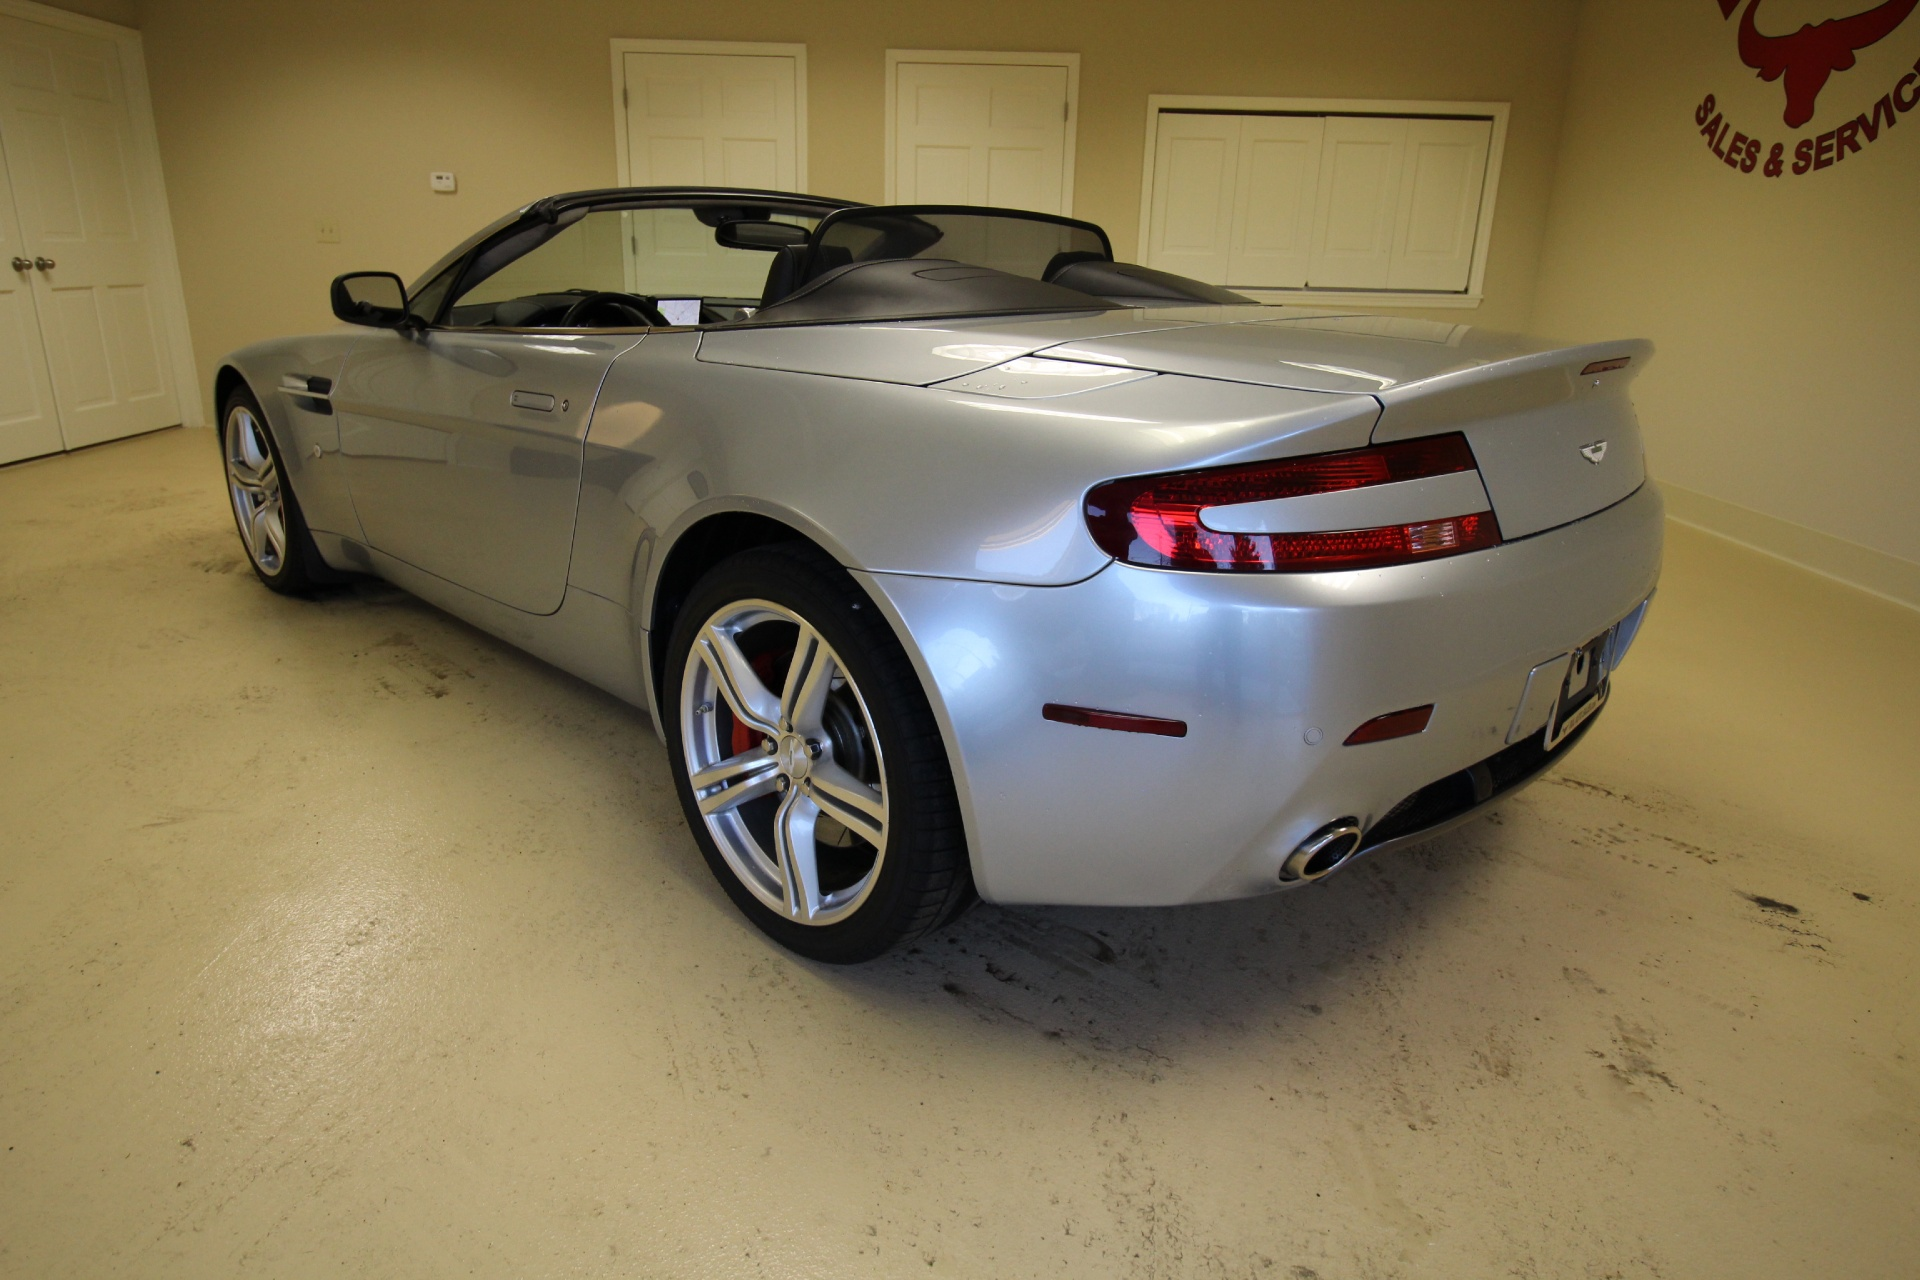 BMW Albany Ny >> 2009 Aston Martin V8 Vantage Roadster CONVERTIBLE,RARE 6 SPEED MANUAL,NAVIGATION,RED CALIPERS ...